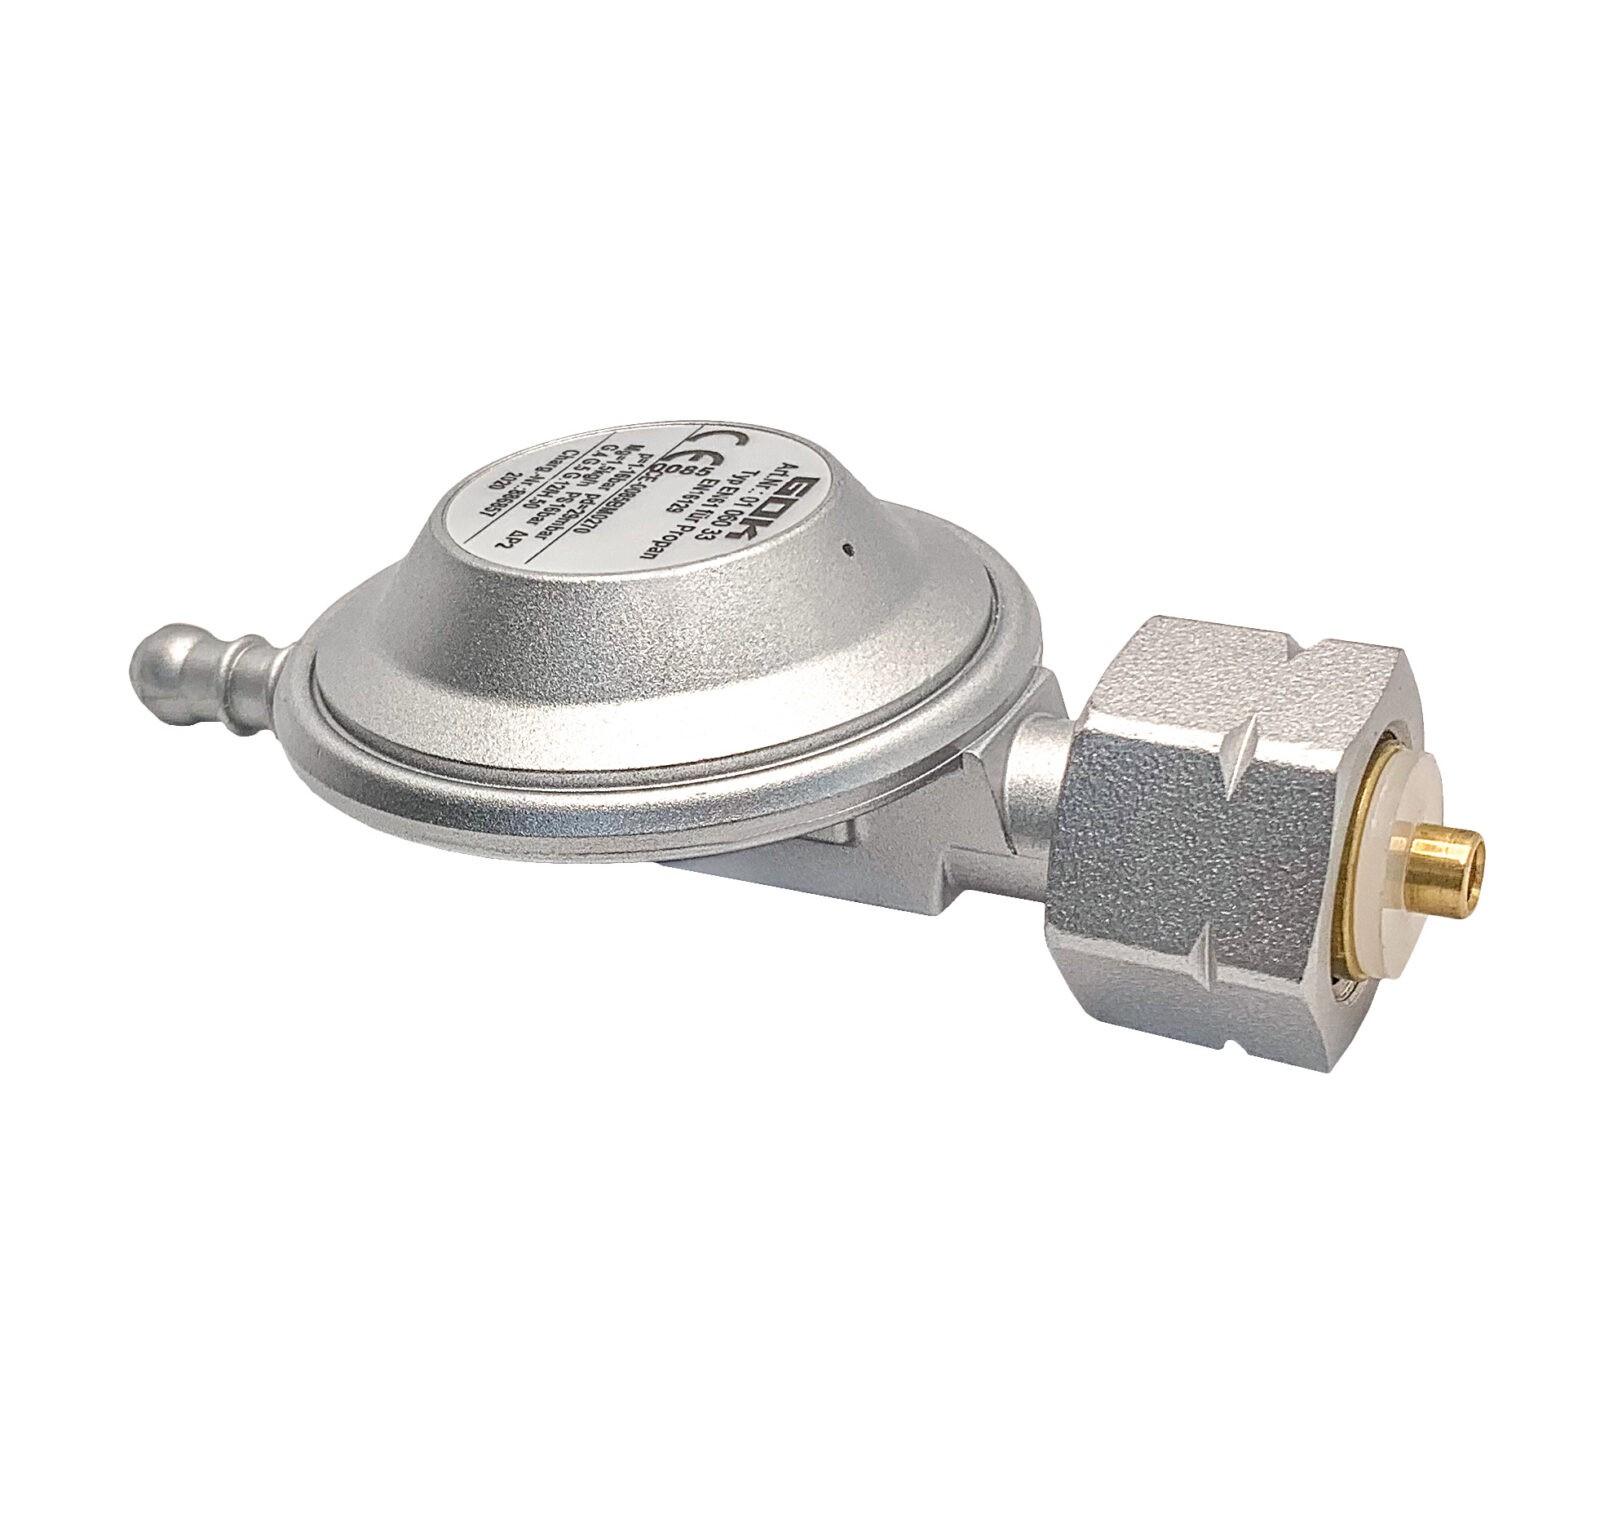 Регулятор давления газа GOK 29мбар 1,5 кг/час Kombi x наконечник Ø8 мм под хомут